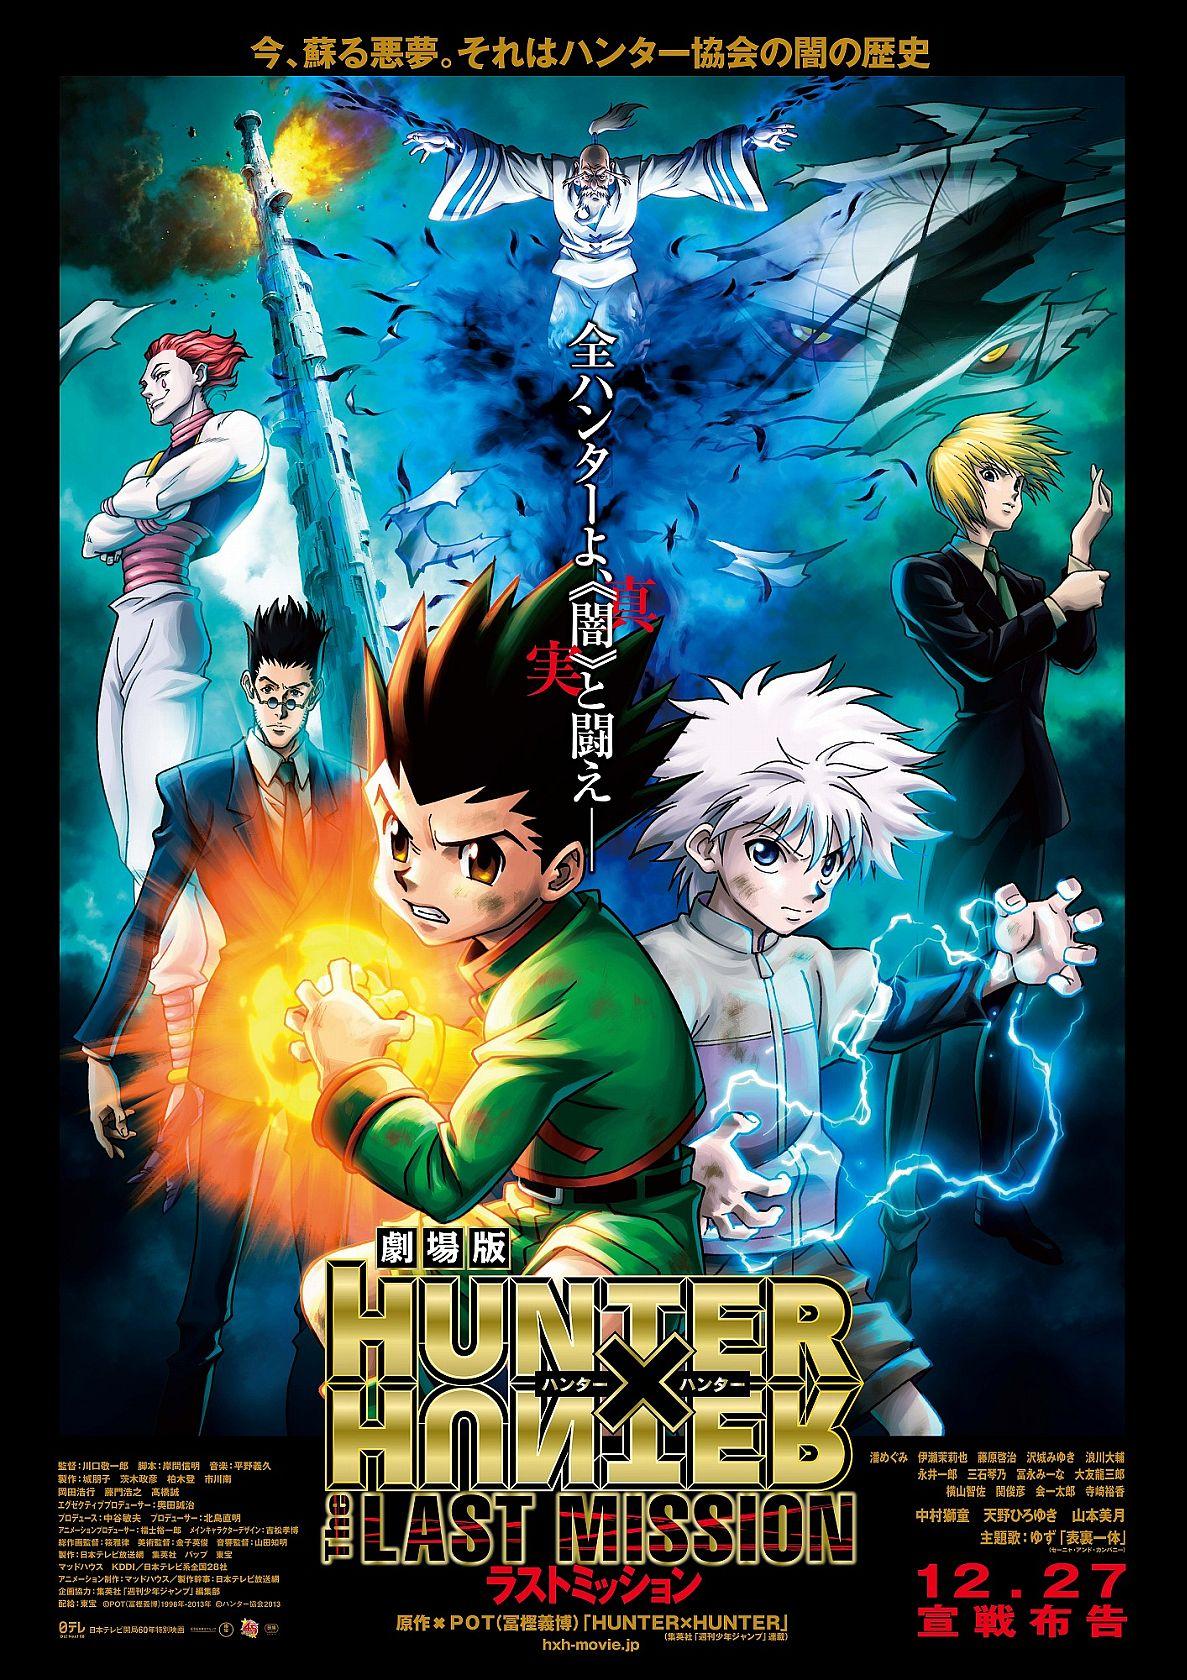 Hunter x Hunter movie 2 | Japanese Anime Wiki | FANDOM ...